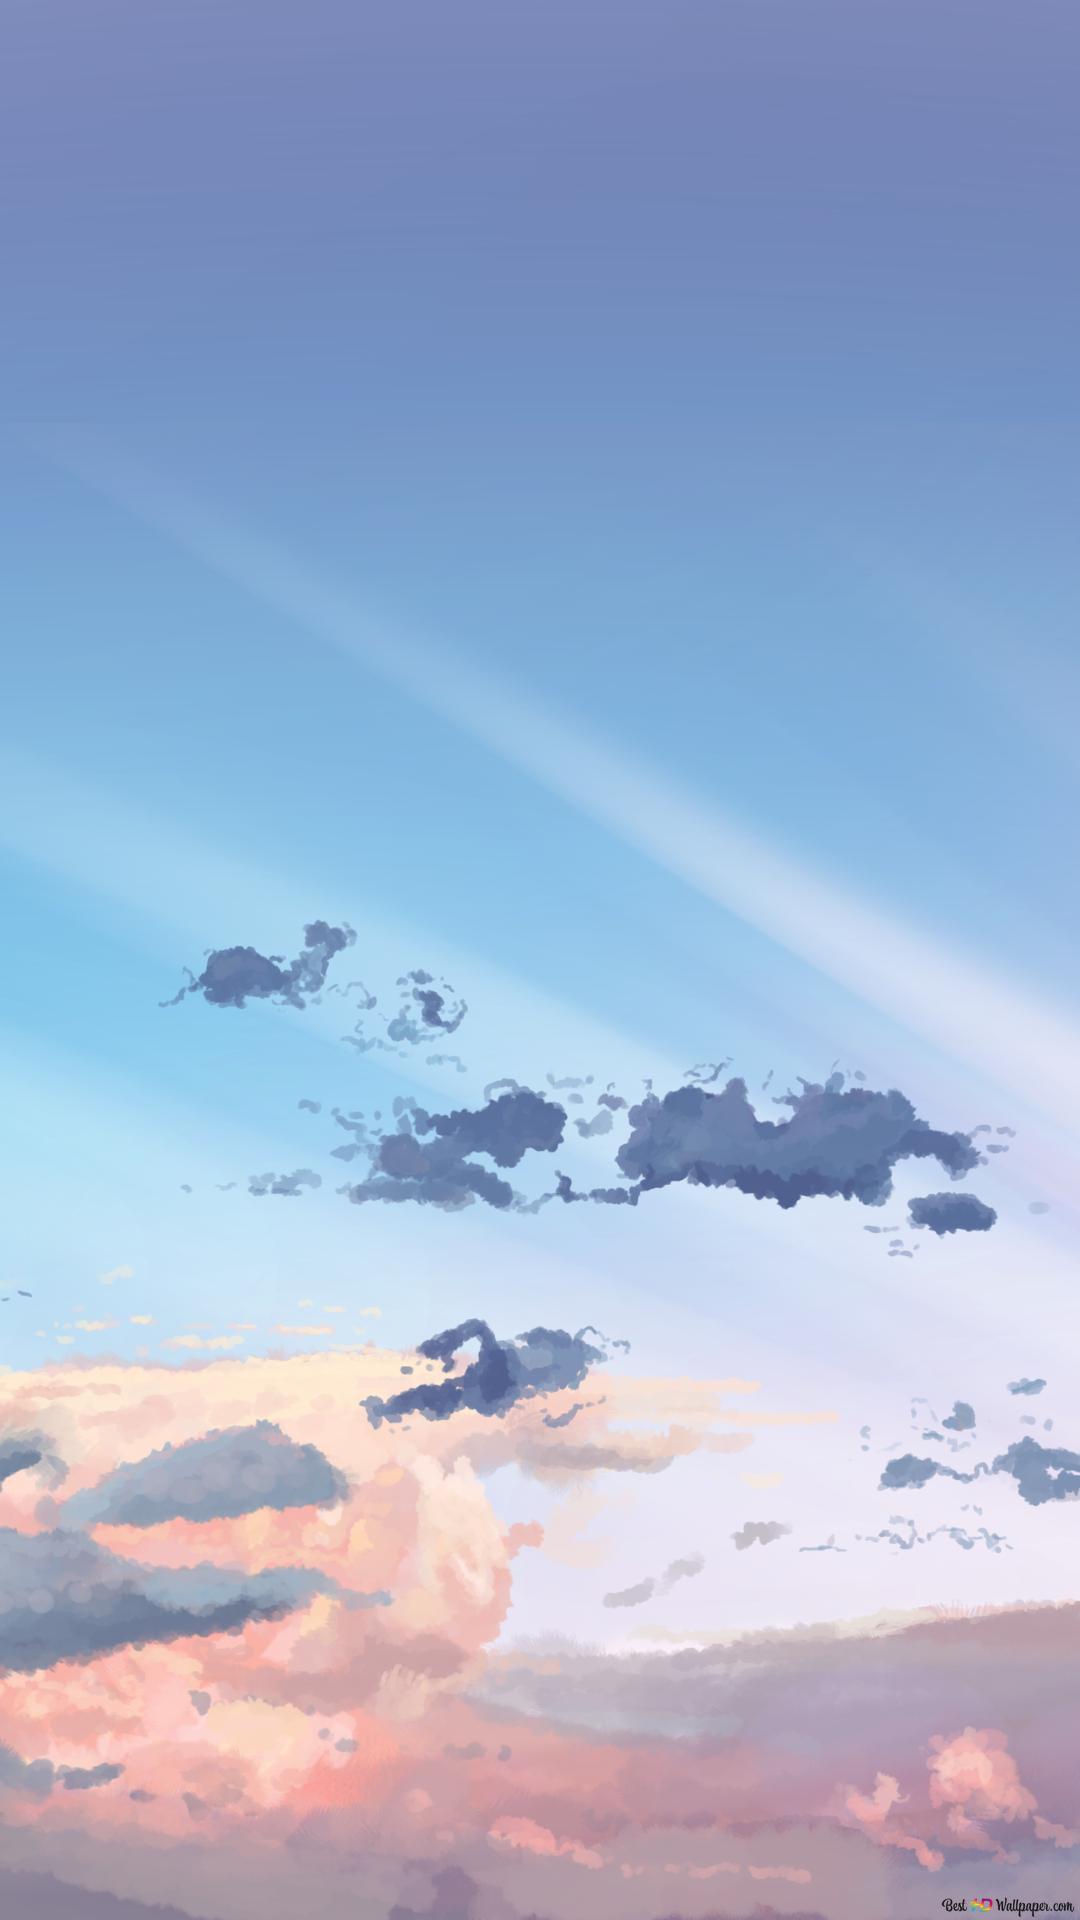 Cloud Blue Sky Anime Hd Wallpaper Download